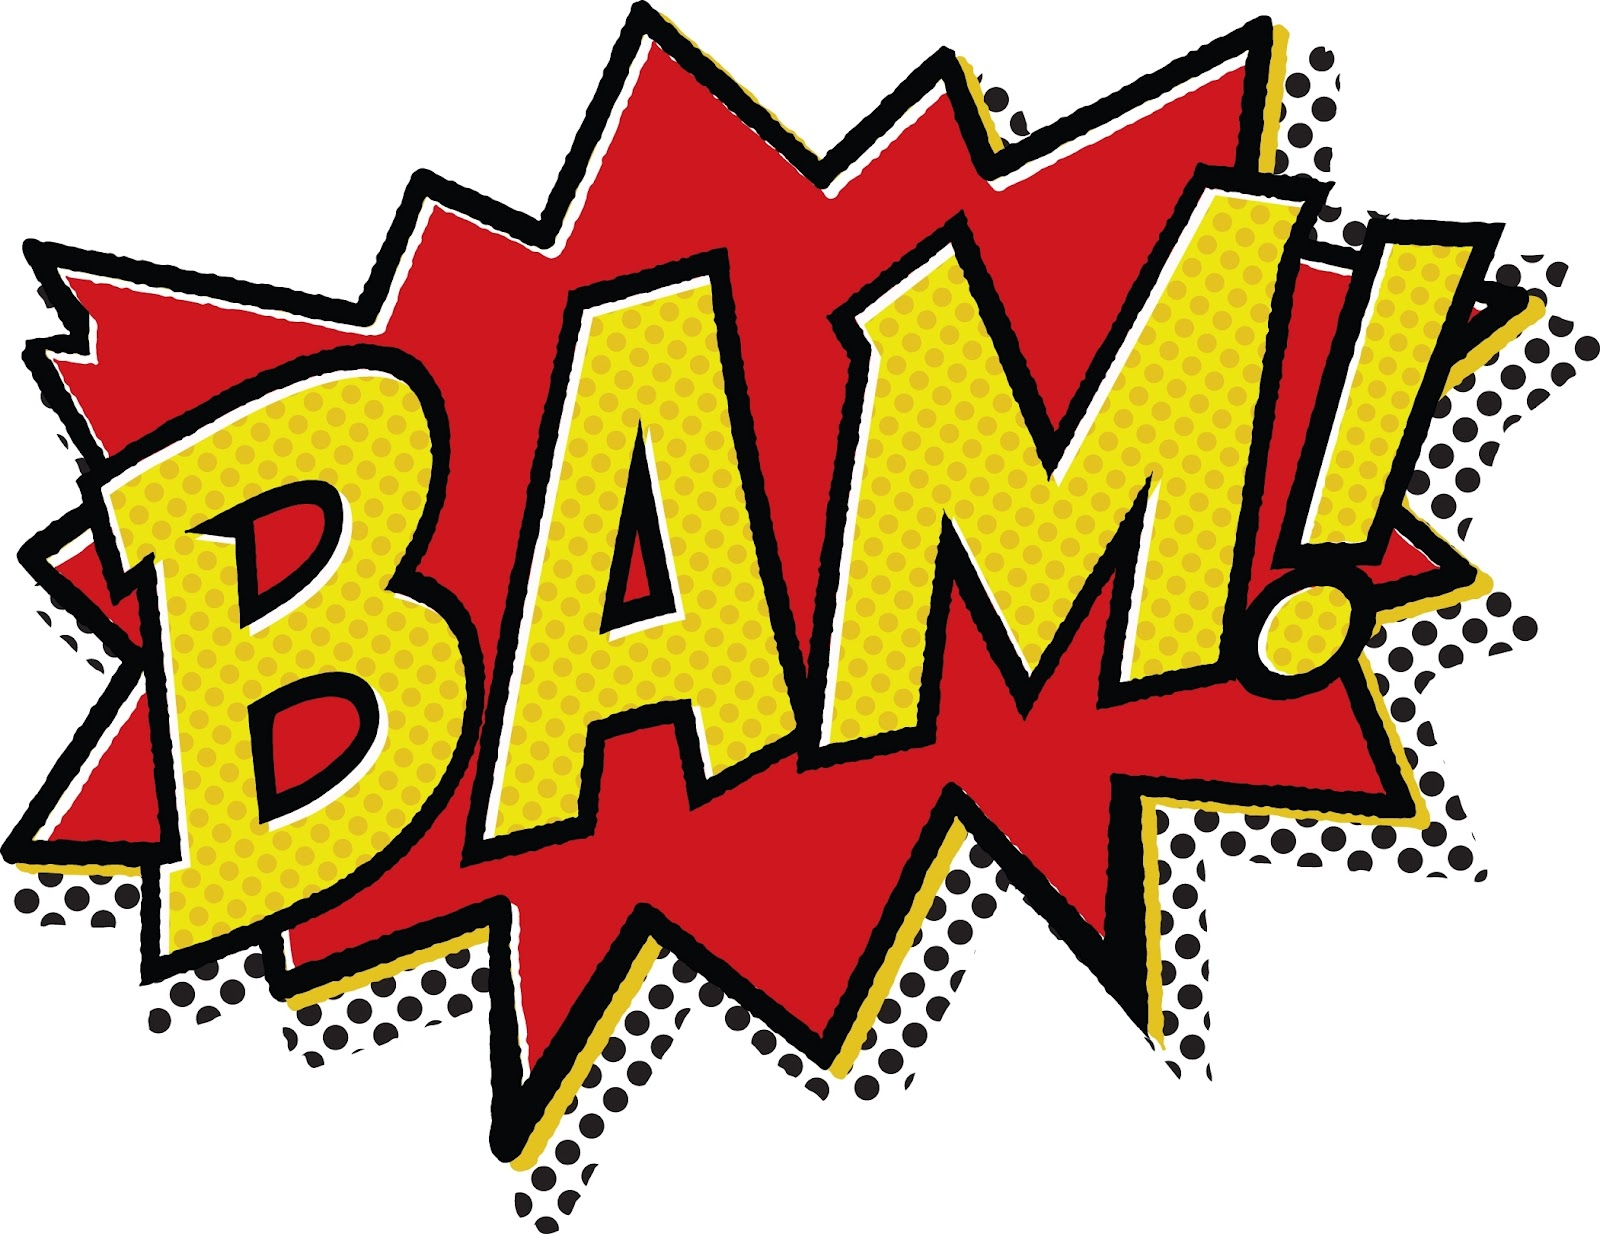 Superhero words superhero pow clipart 3-Superhero words superhero pow clipart 3-18